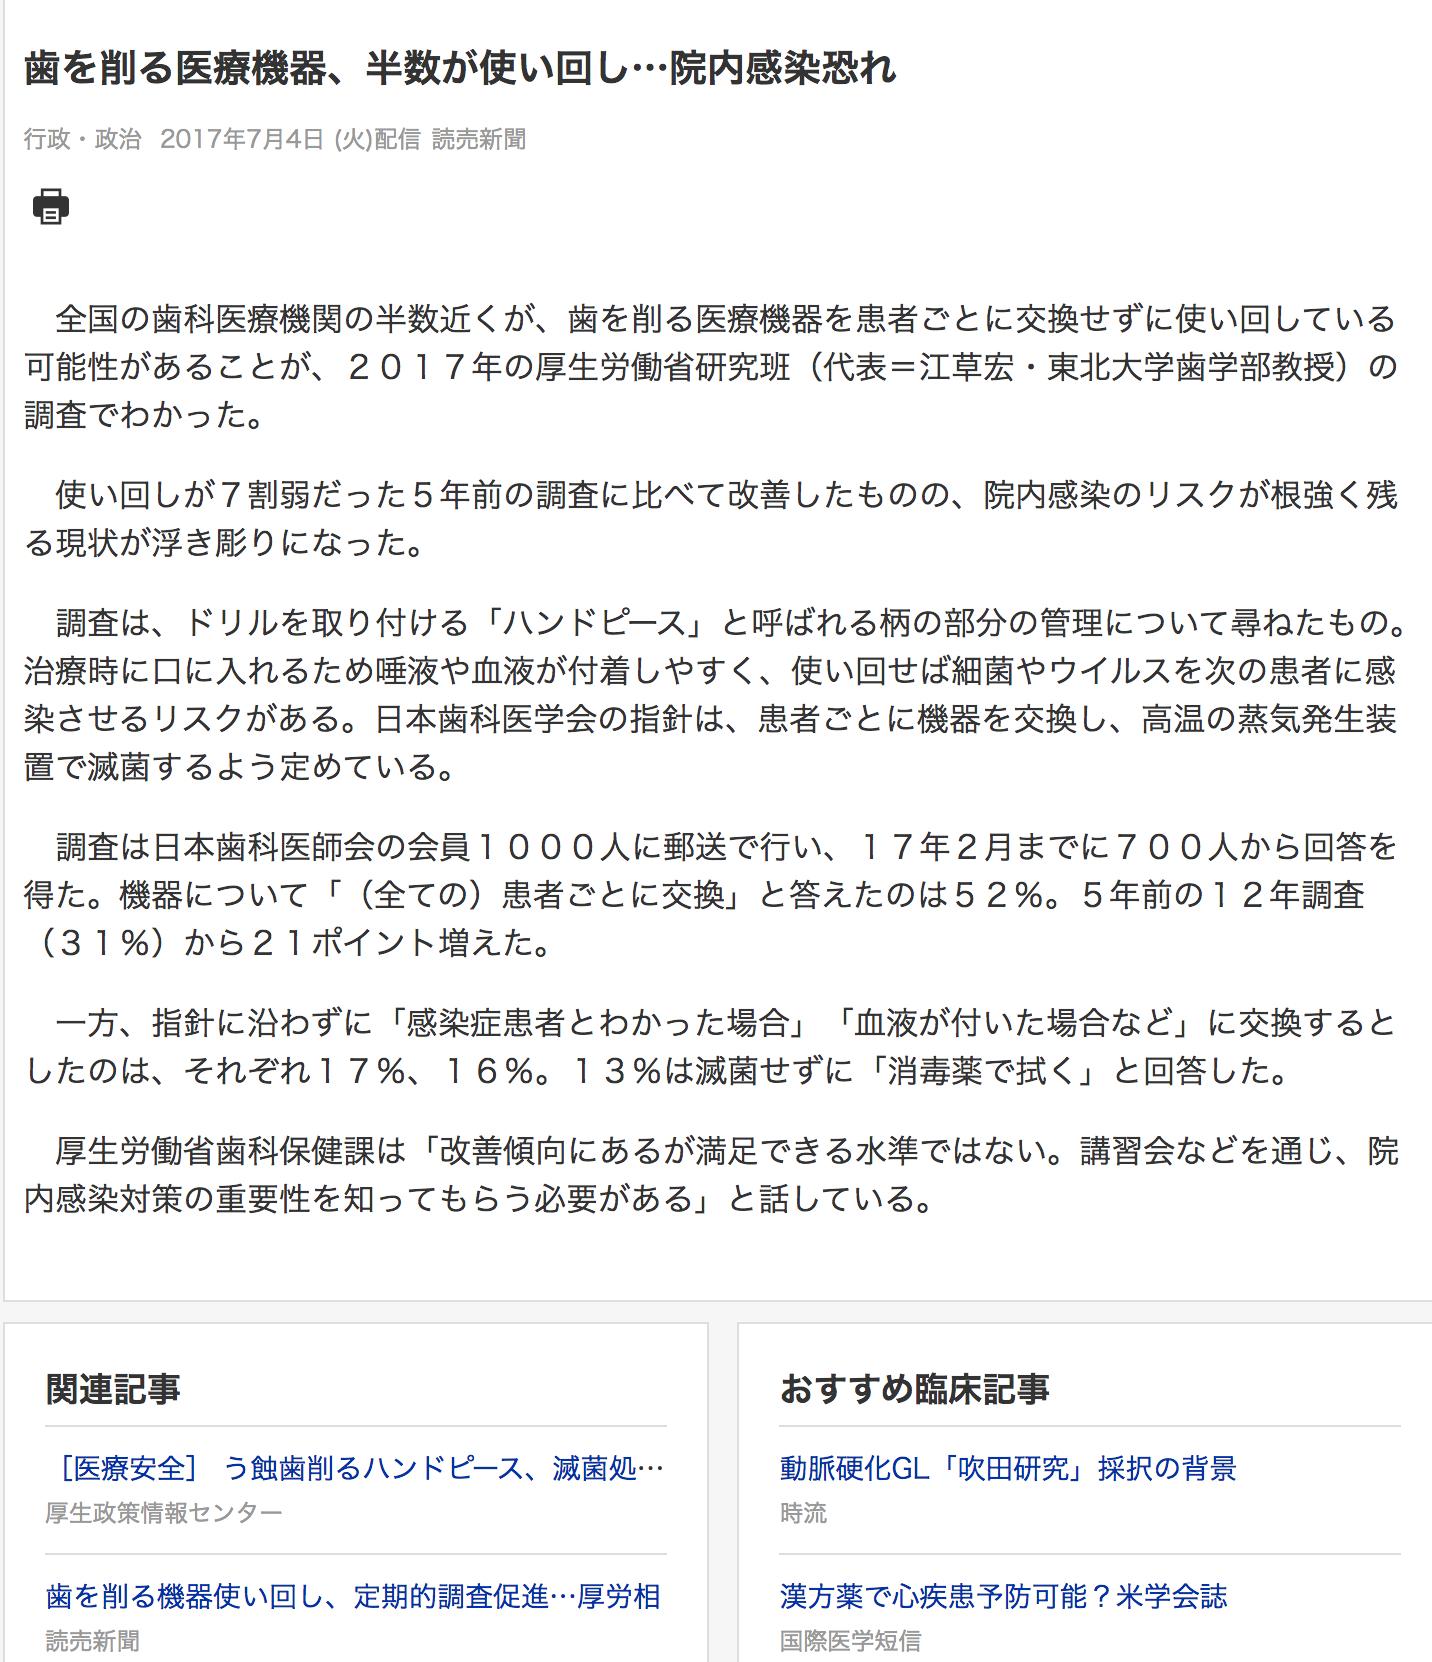 FirefoxScreenSnapz011.jpg